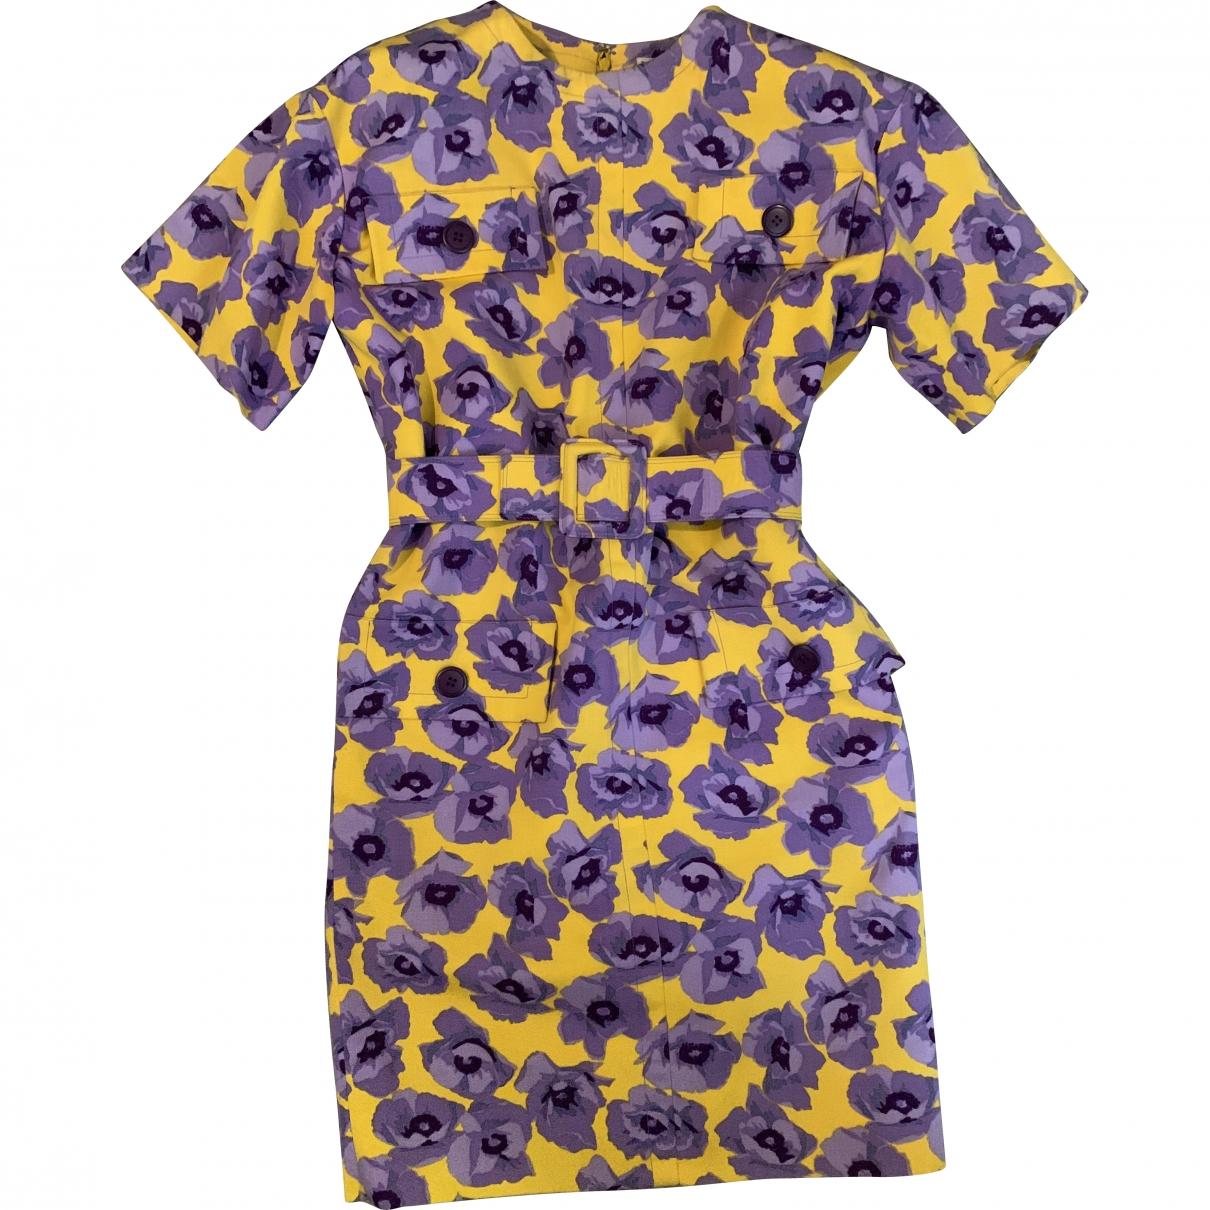 Givenchy \N Kleid in  Bunt Baumwolle